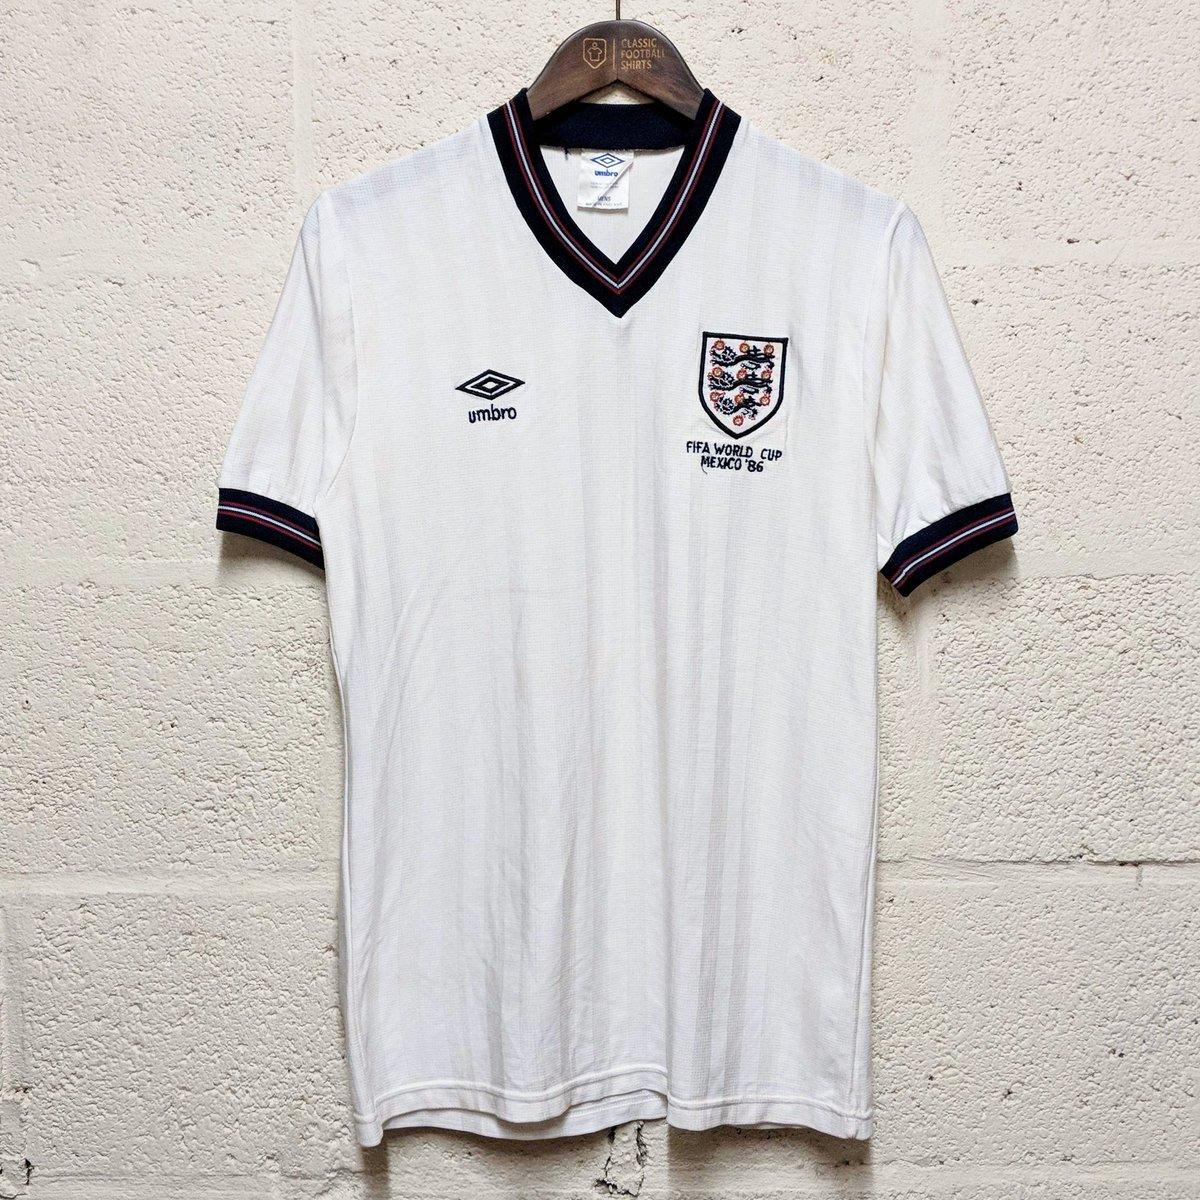 competitive price b60eb 96205 England Replica Football Shirts - raveitsafe